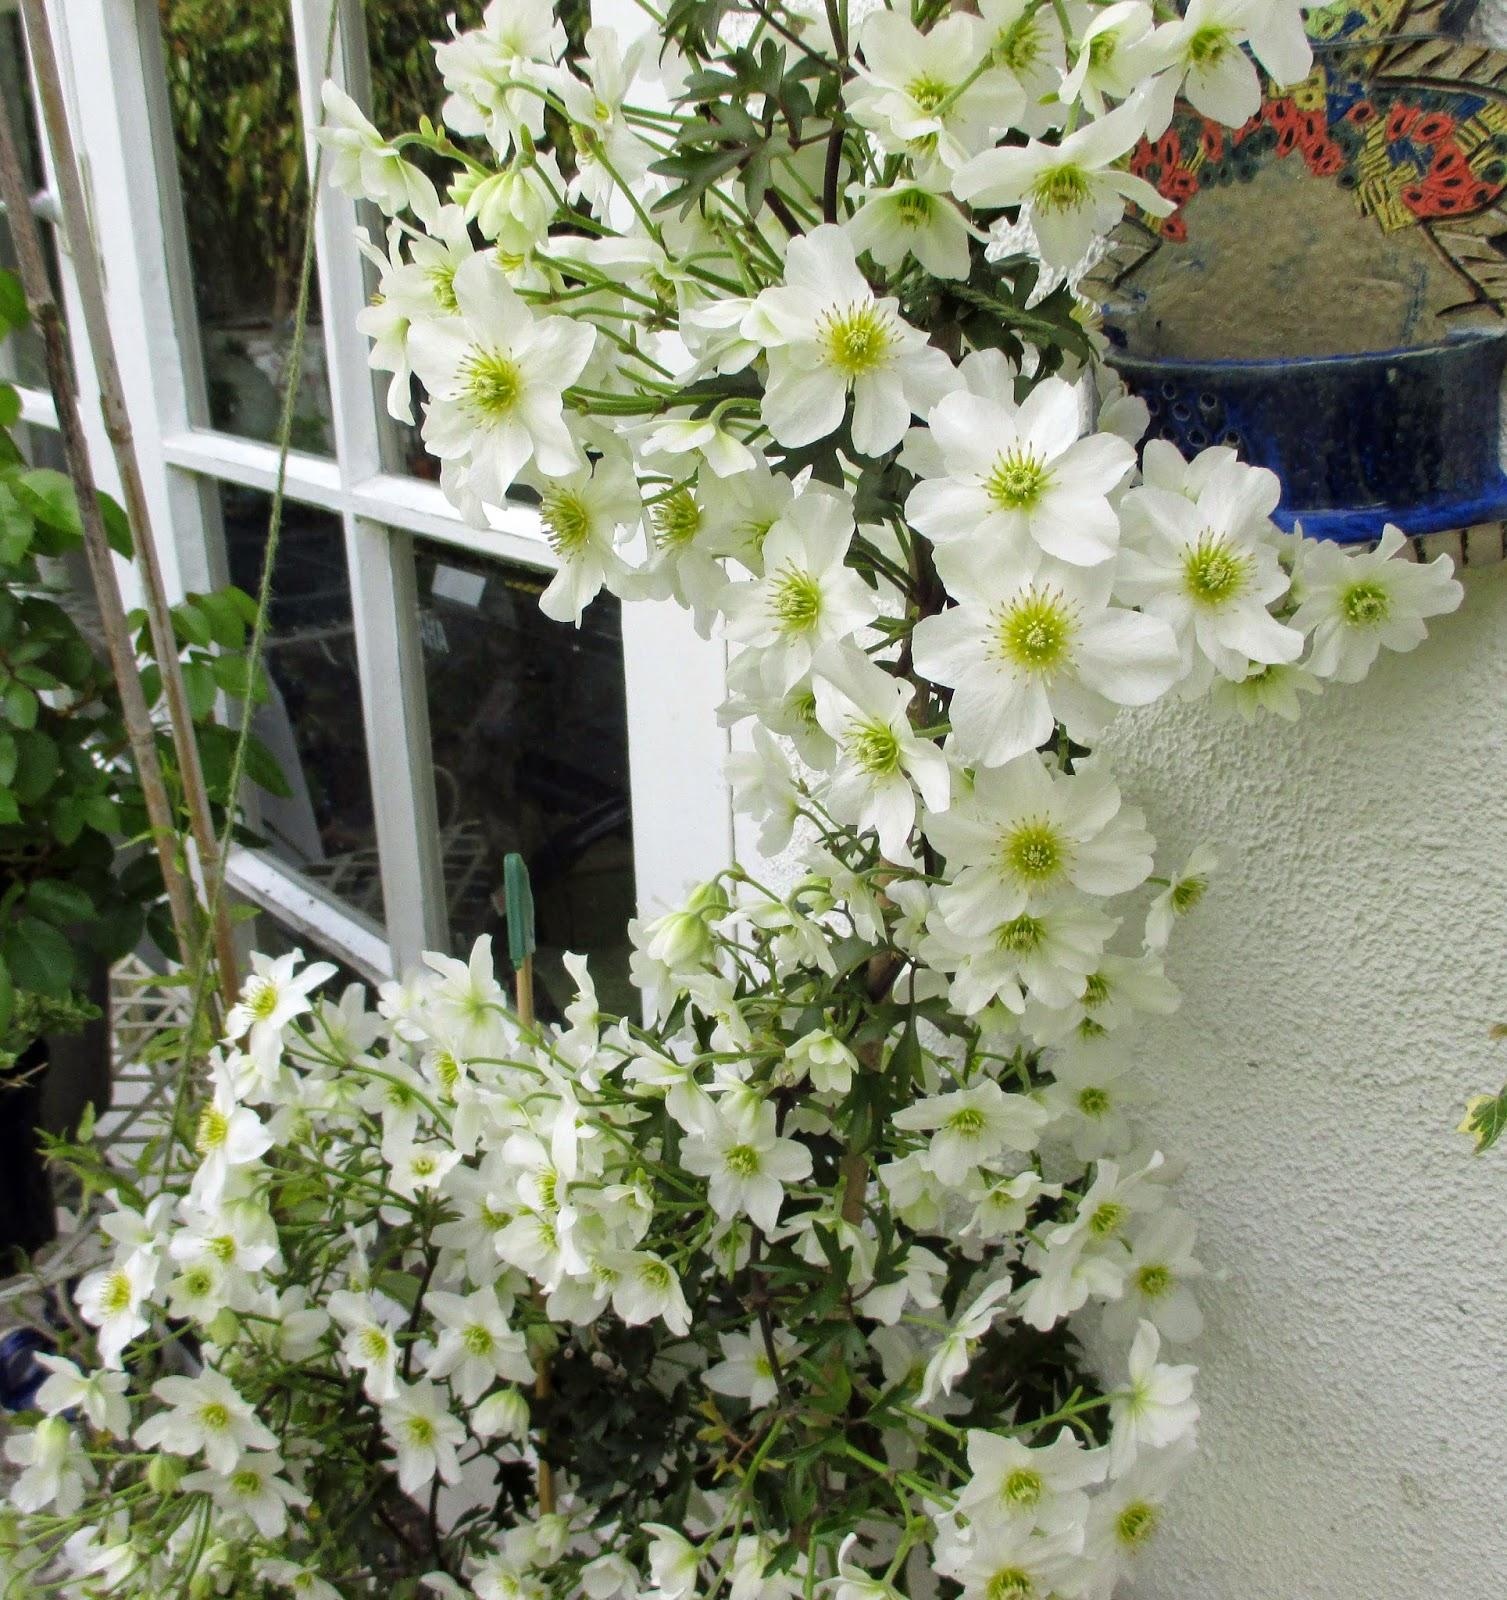 BeadBag: Spring In The Garden